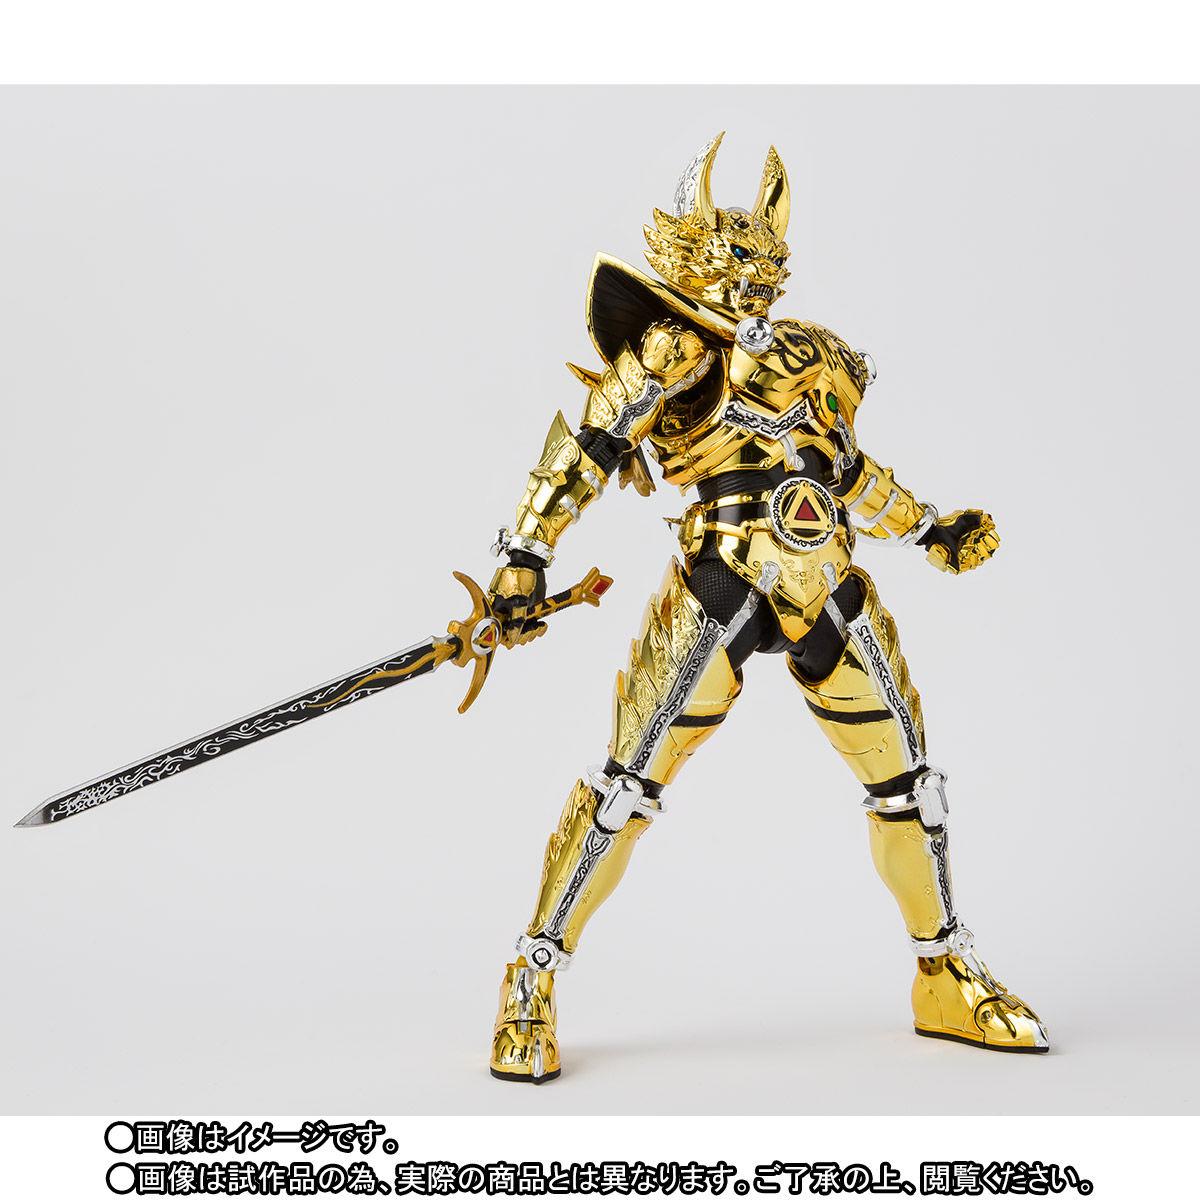 S.H.フィギュアーツ(真骨彫製法)『黄金騎士ガロ(冴島雷牙)』牙狼〈GARO〉可動フィギュア-005